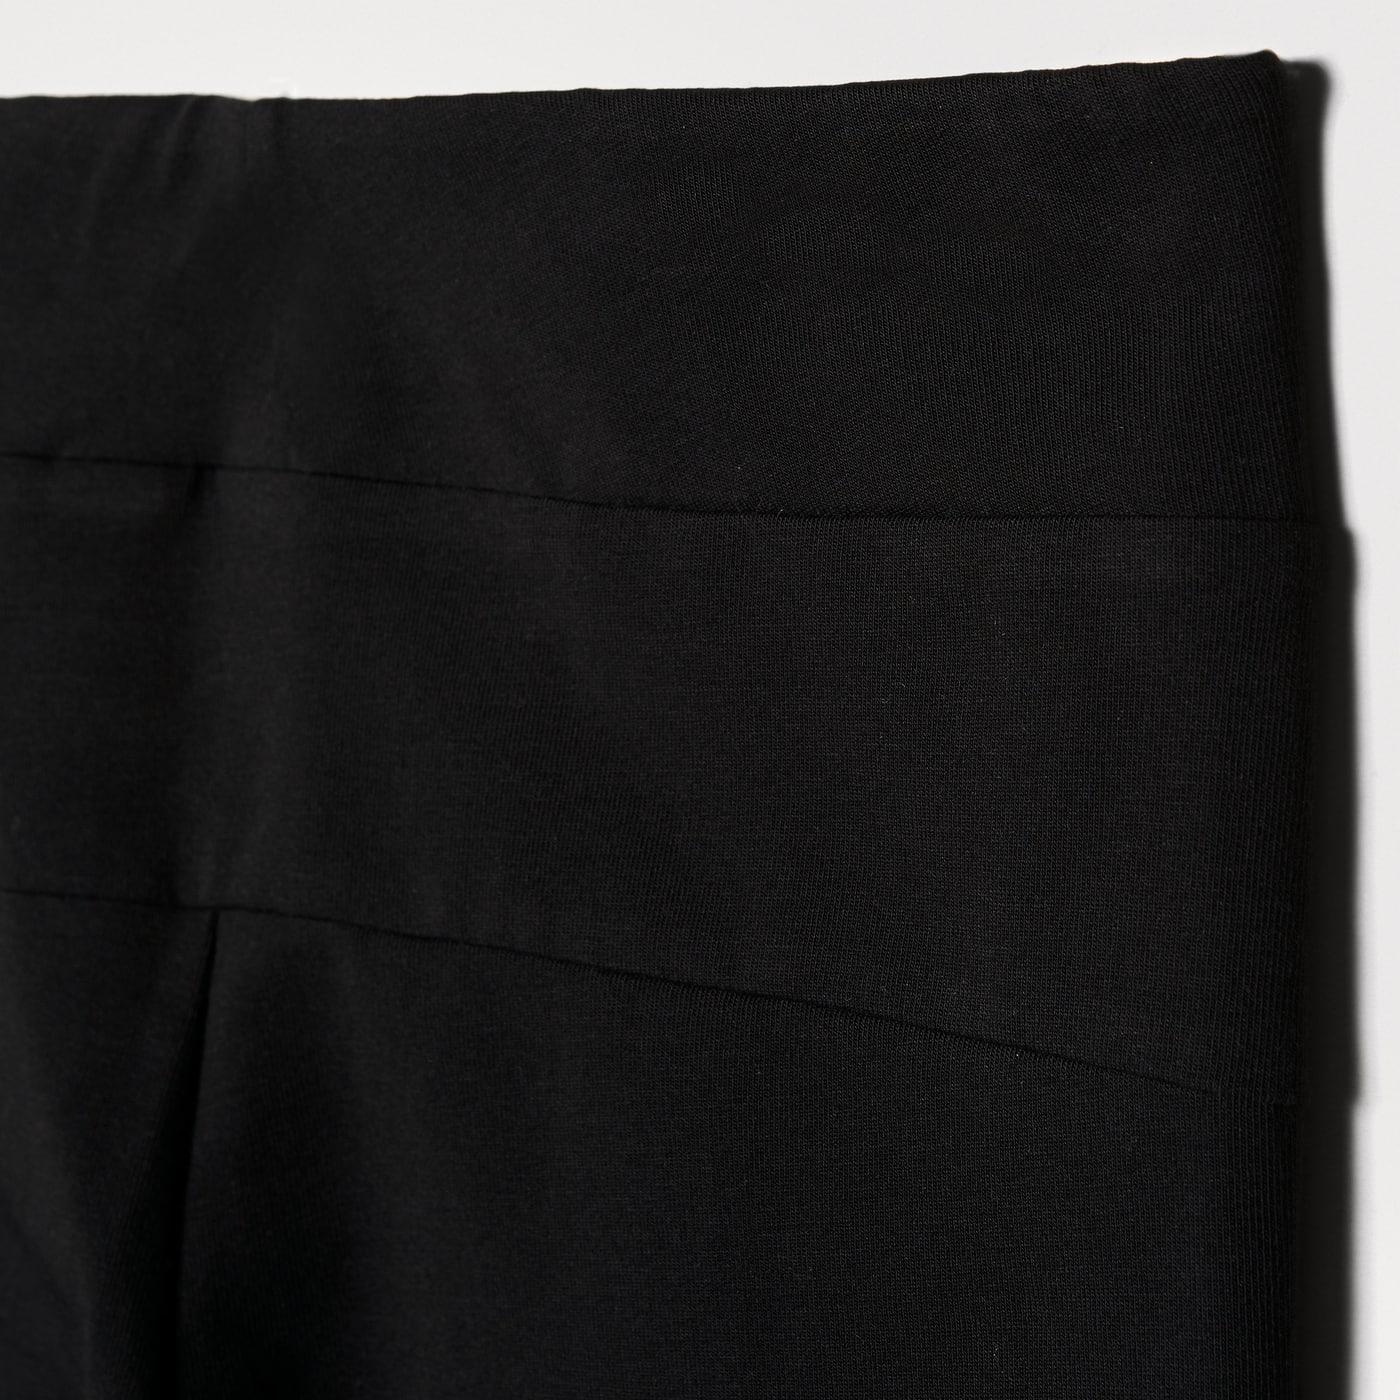 Pour Linear Fille Adidas Essentials Tight Migros Leggings qawApv5wn